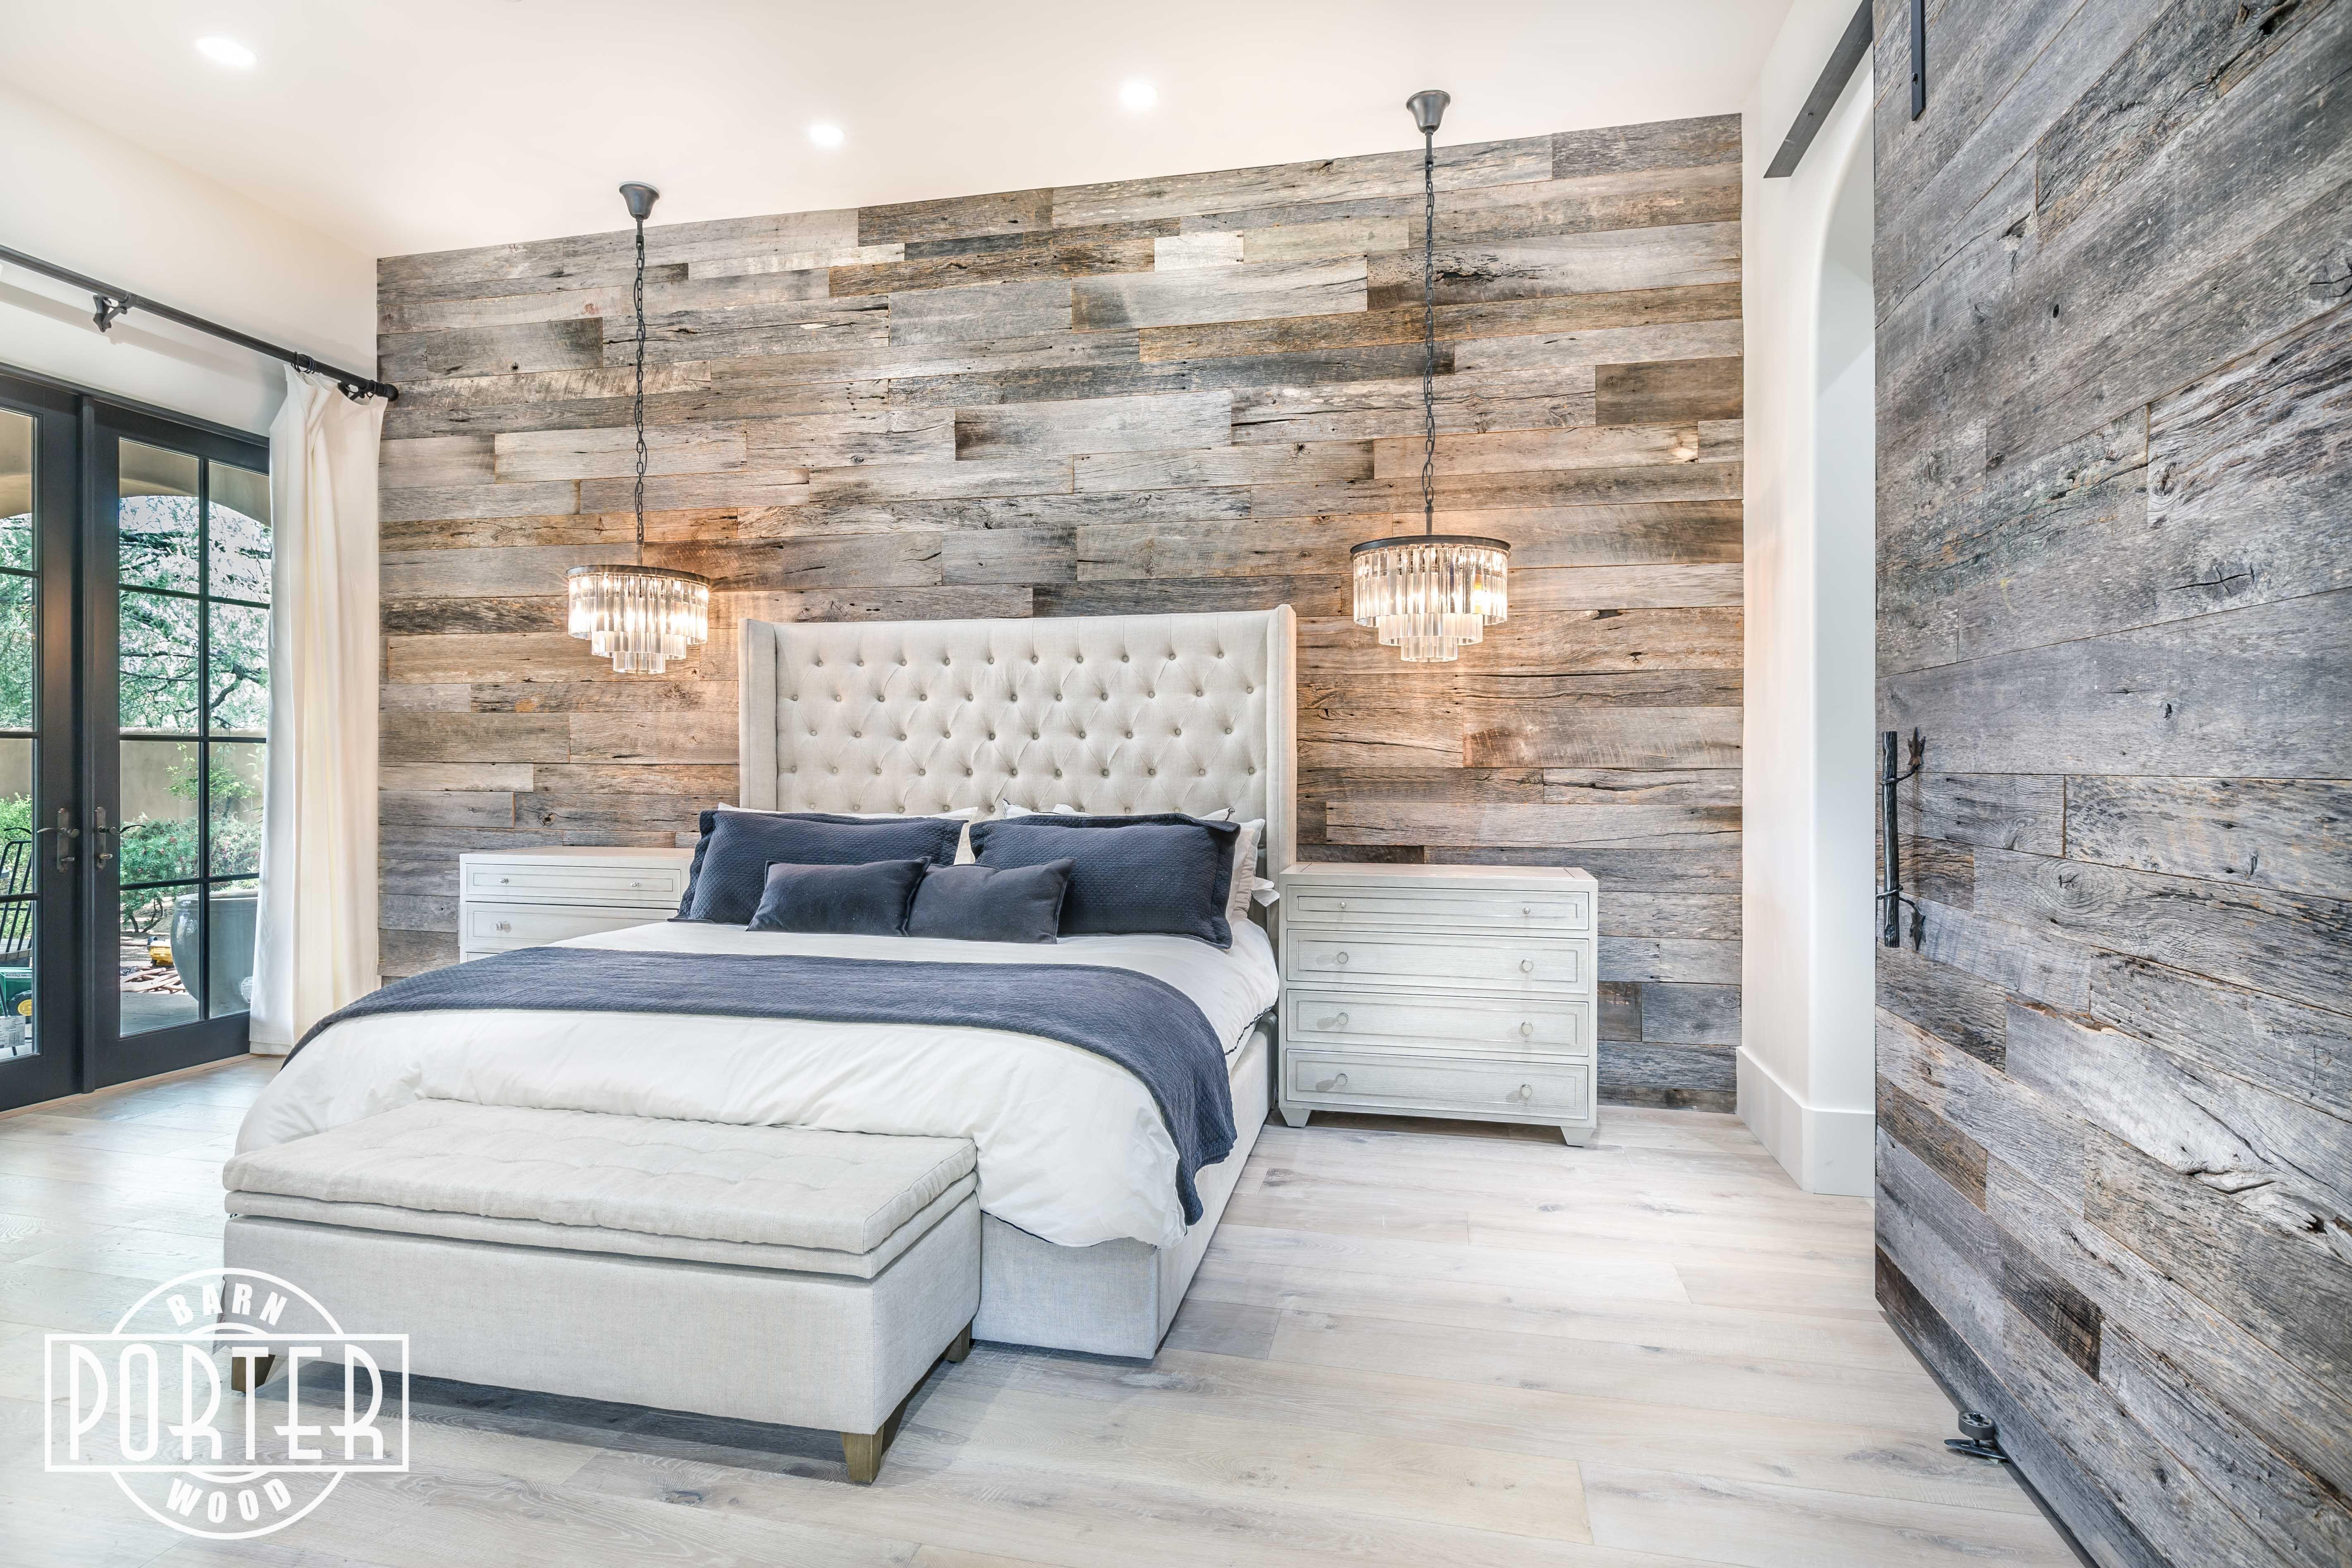 Pbw Tobacco Barn Grey Wood Wall Master Bedroom Guest Bedroom Remodel Remodel Bedroom Master Bedroom Remodel